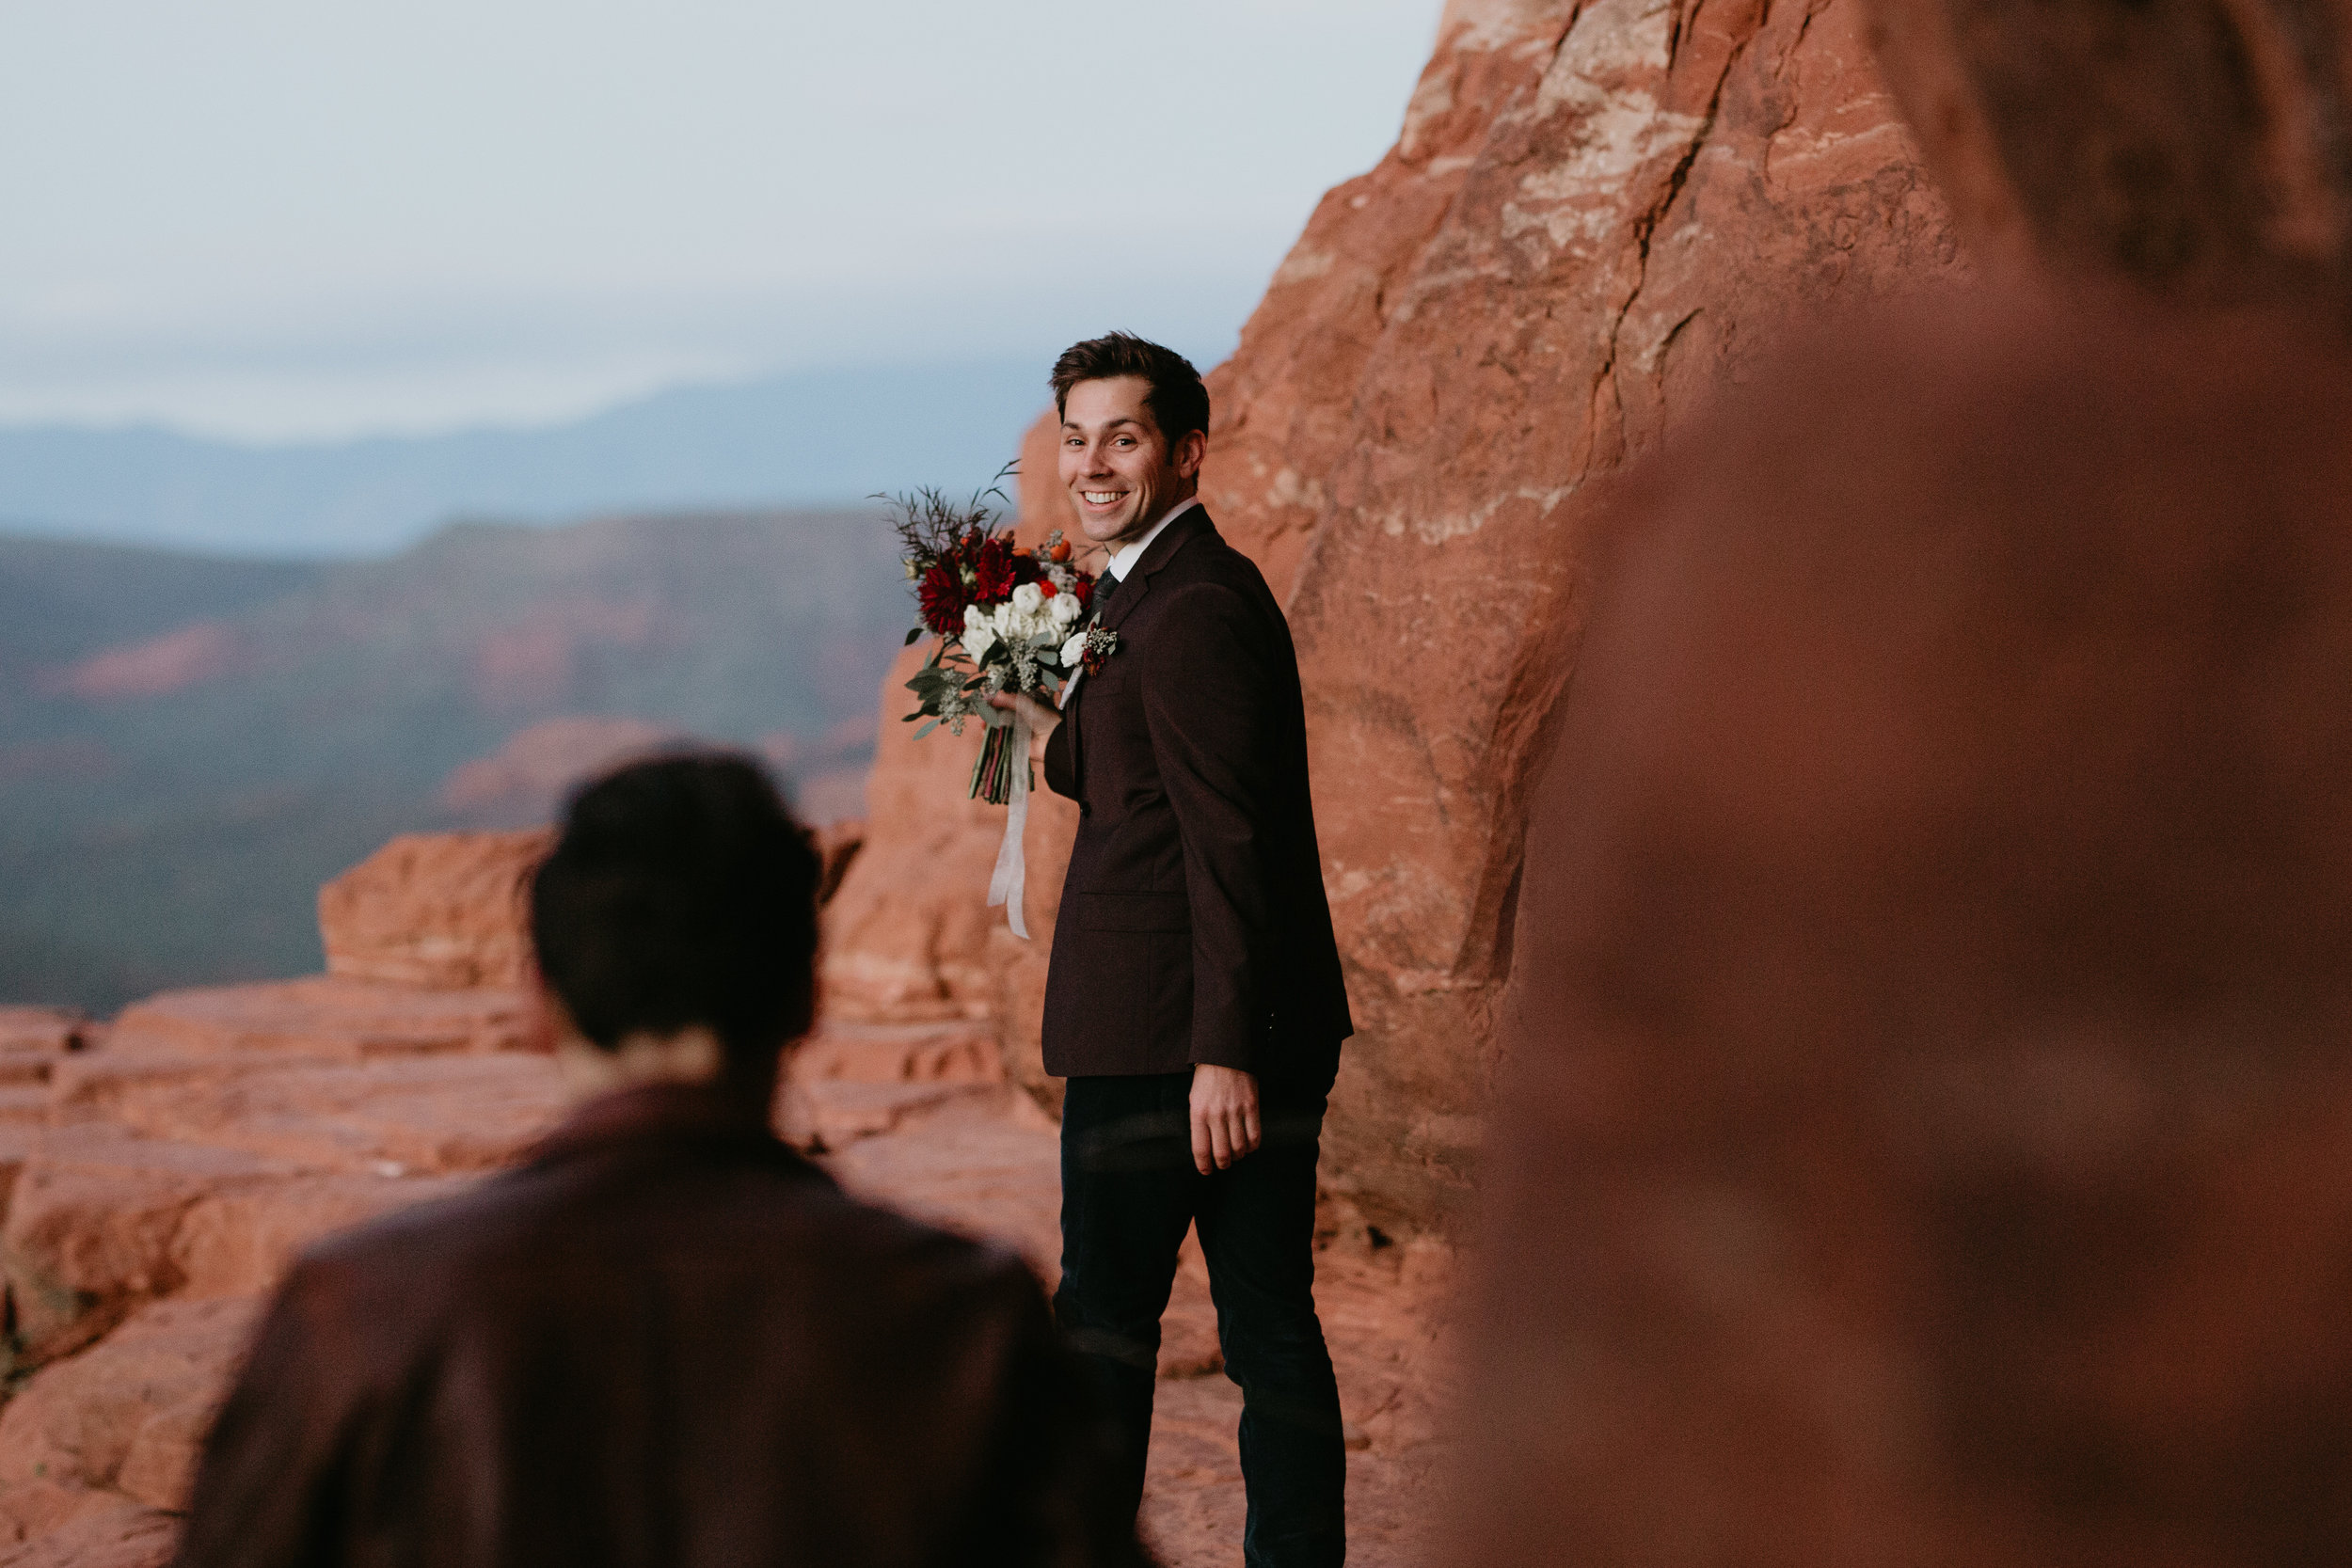 nicole-daacke-photography-sedona-arizona-destination-elopement-wedding-photographer-catherdral-rock-hiking-elopement-sedona-river-elopement-photos-desert-rock-wedding-photographer-laid-back-spontaneous-elopement-9.jpg